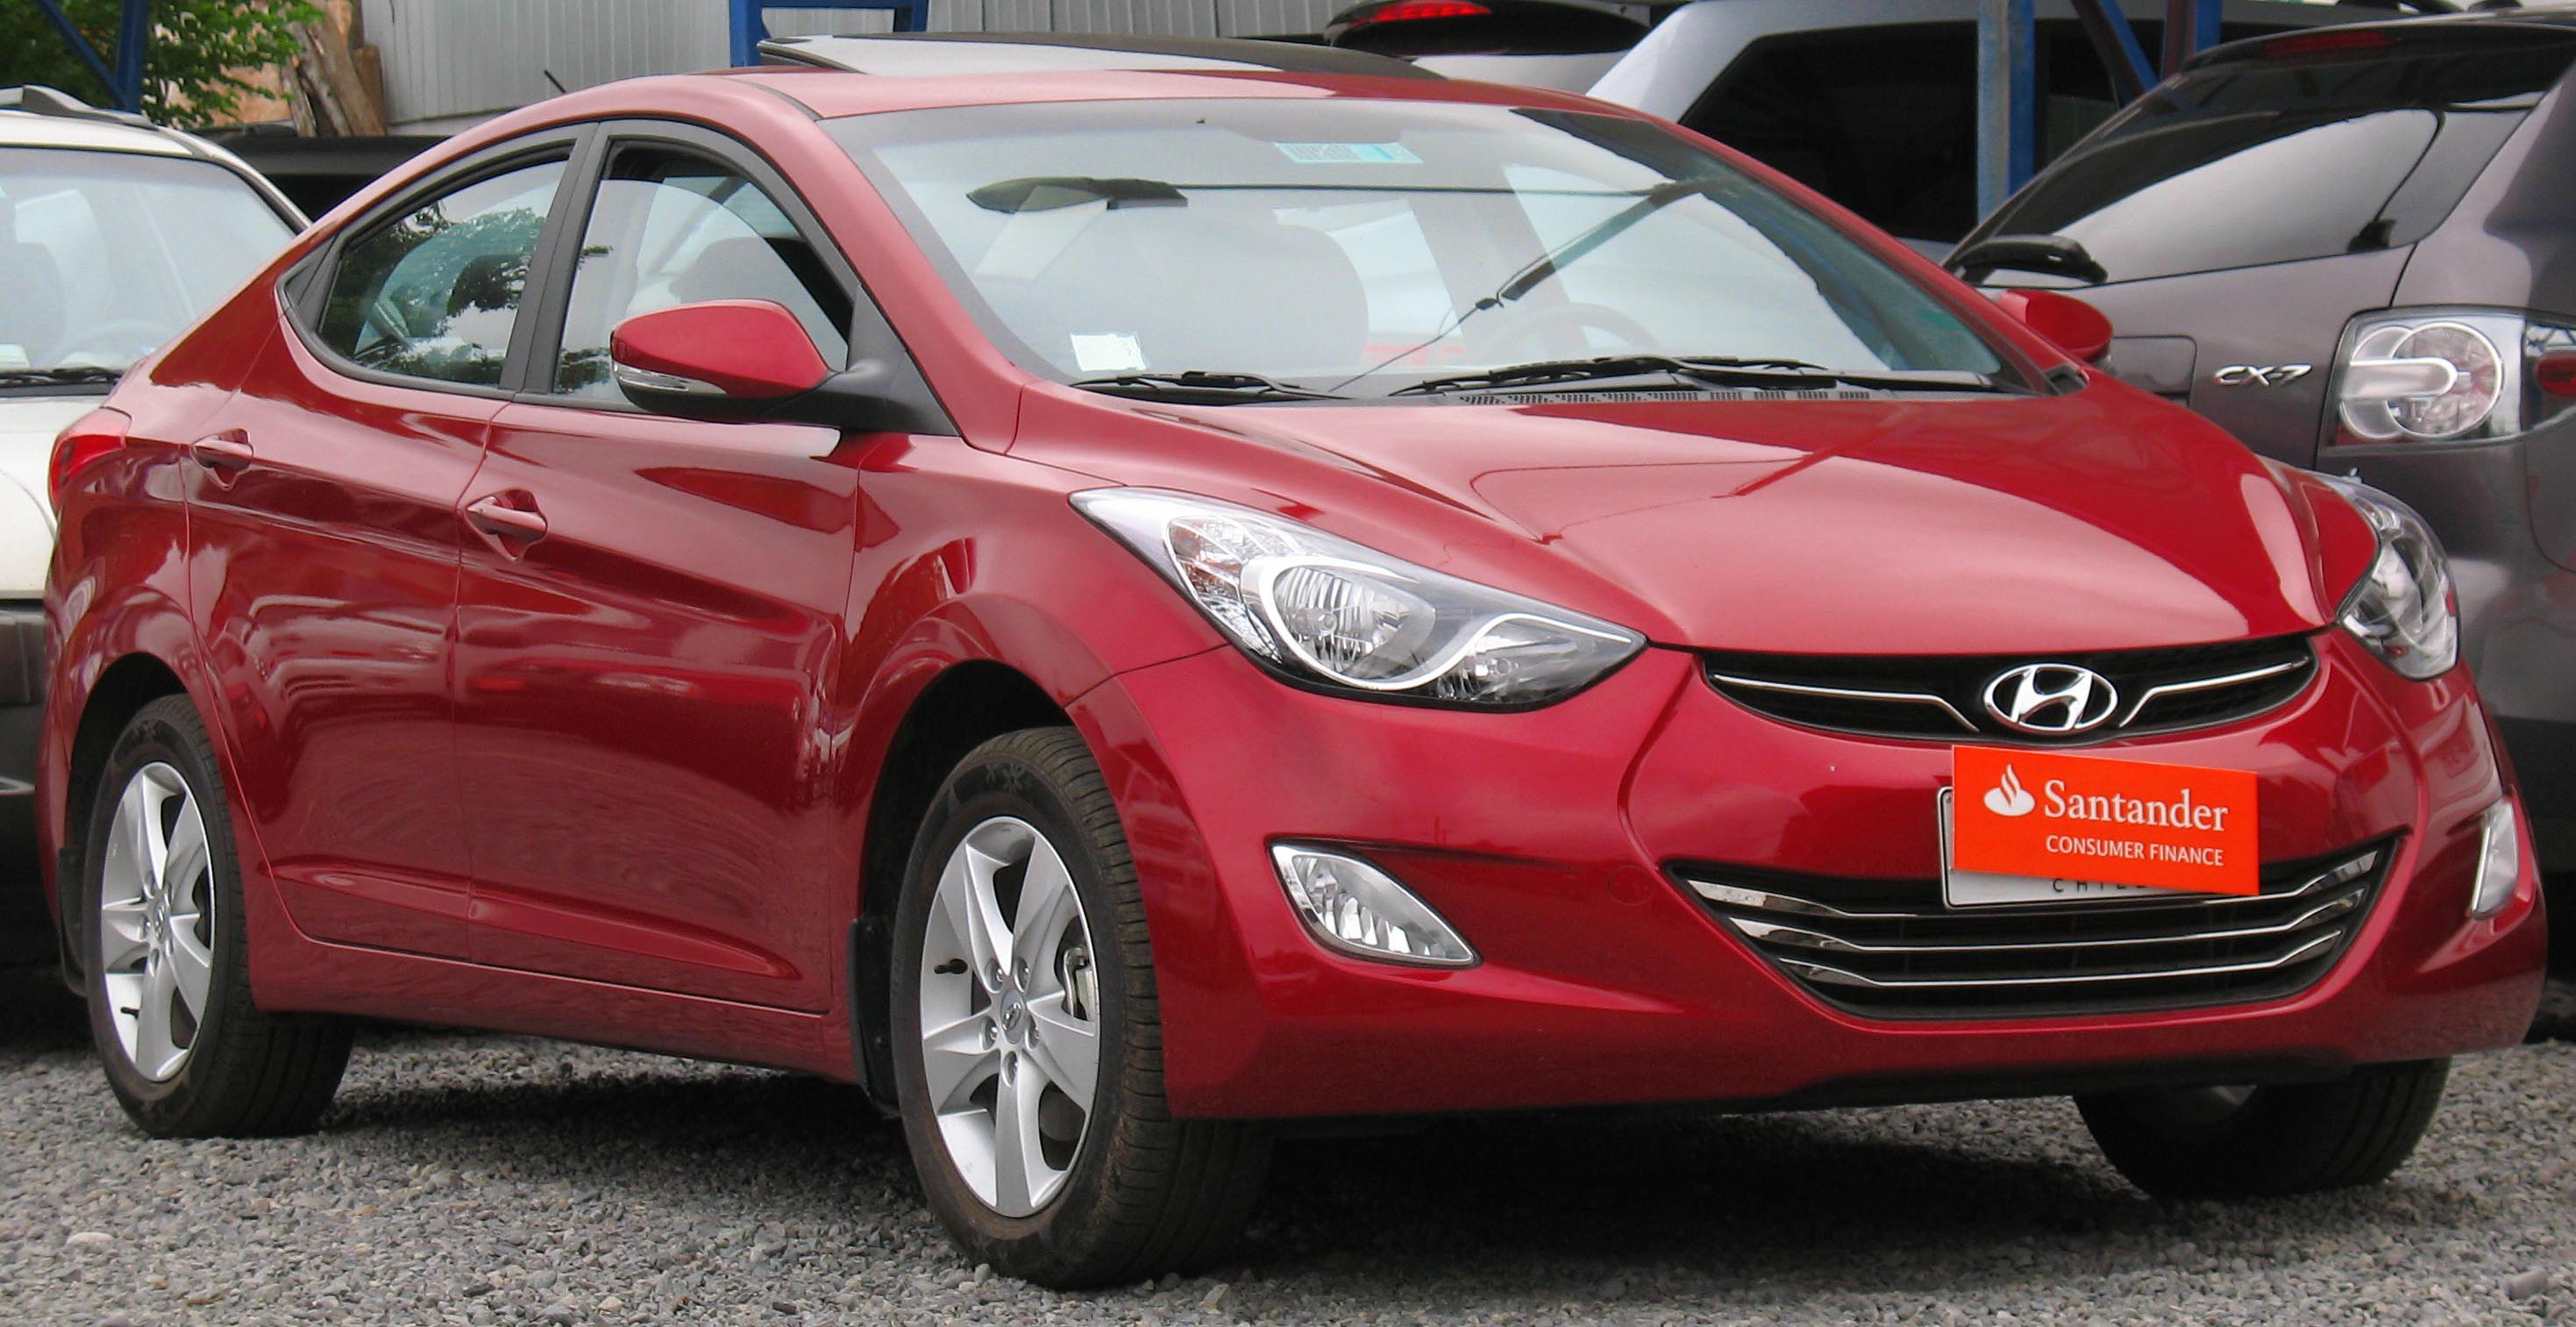 Hyundai Elantra: Consumer information